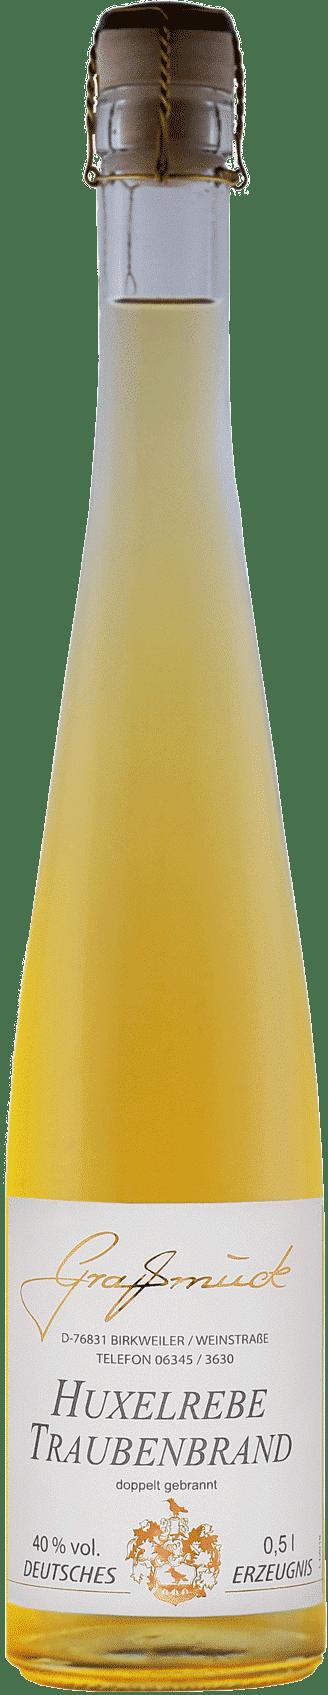 Weingut Ludwig Graßmück, Simon Graßmück, Huxelrebe Traubenbrand